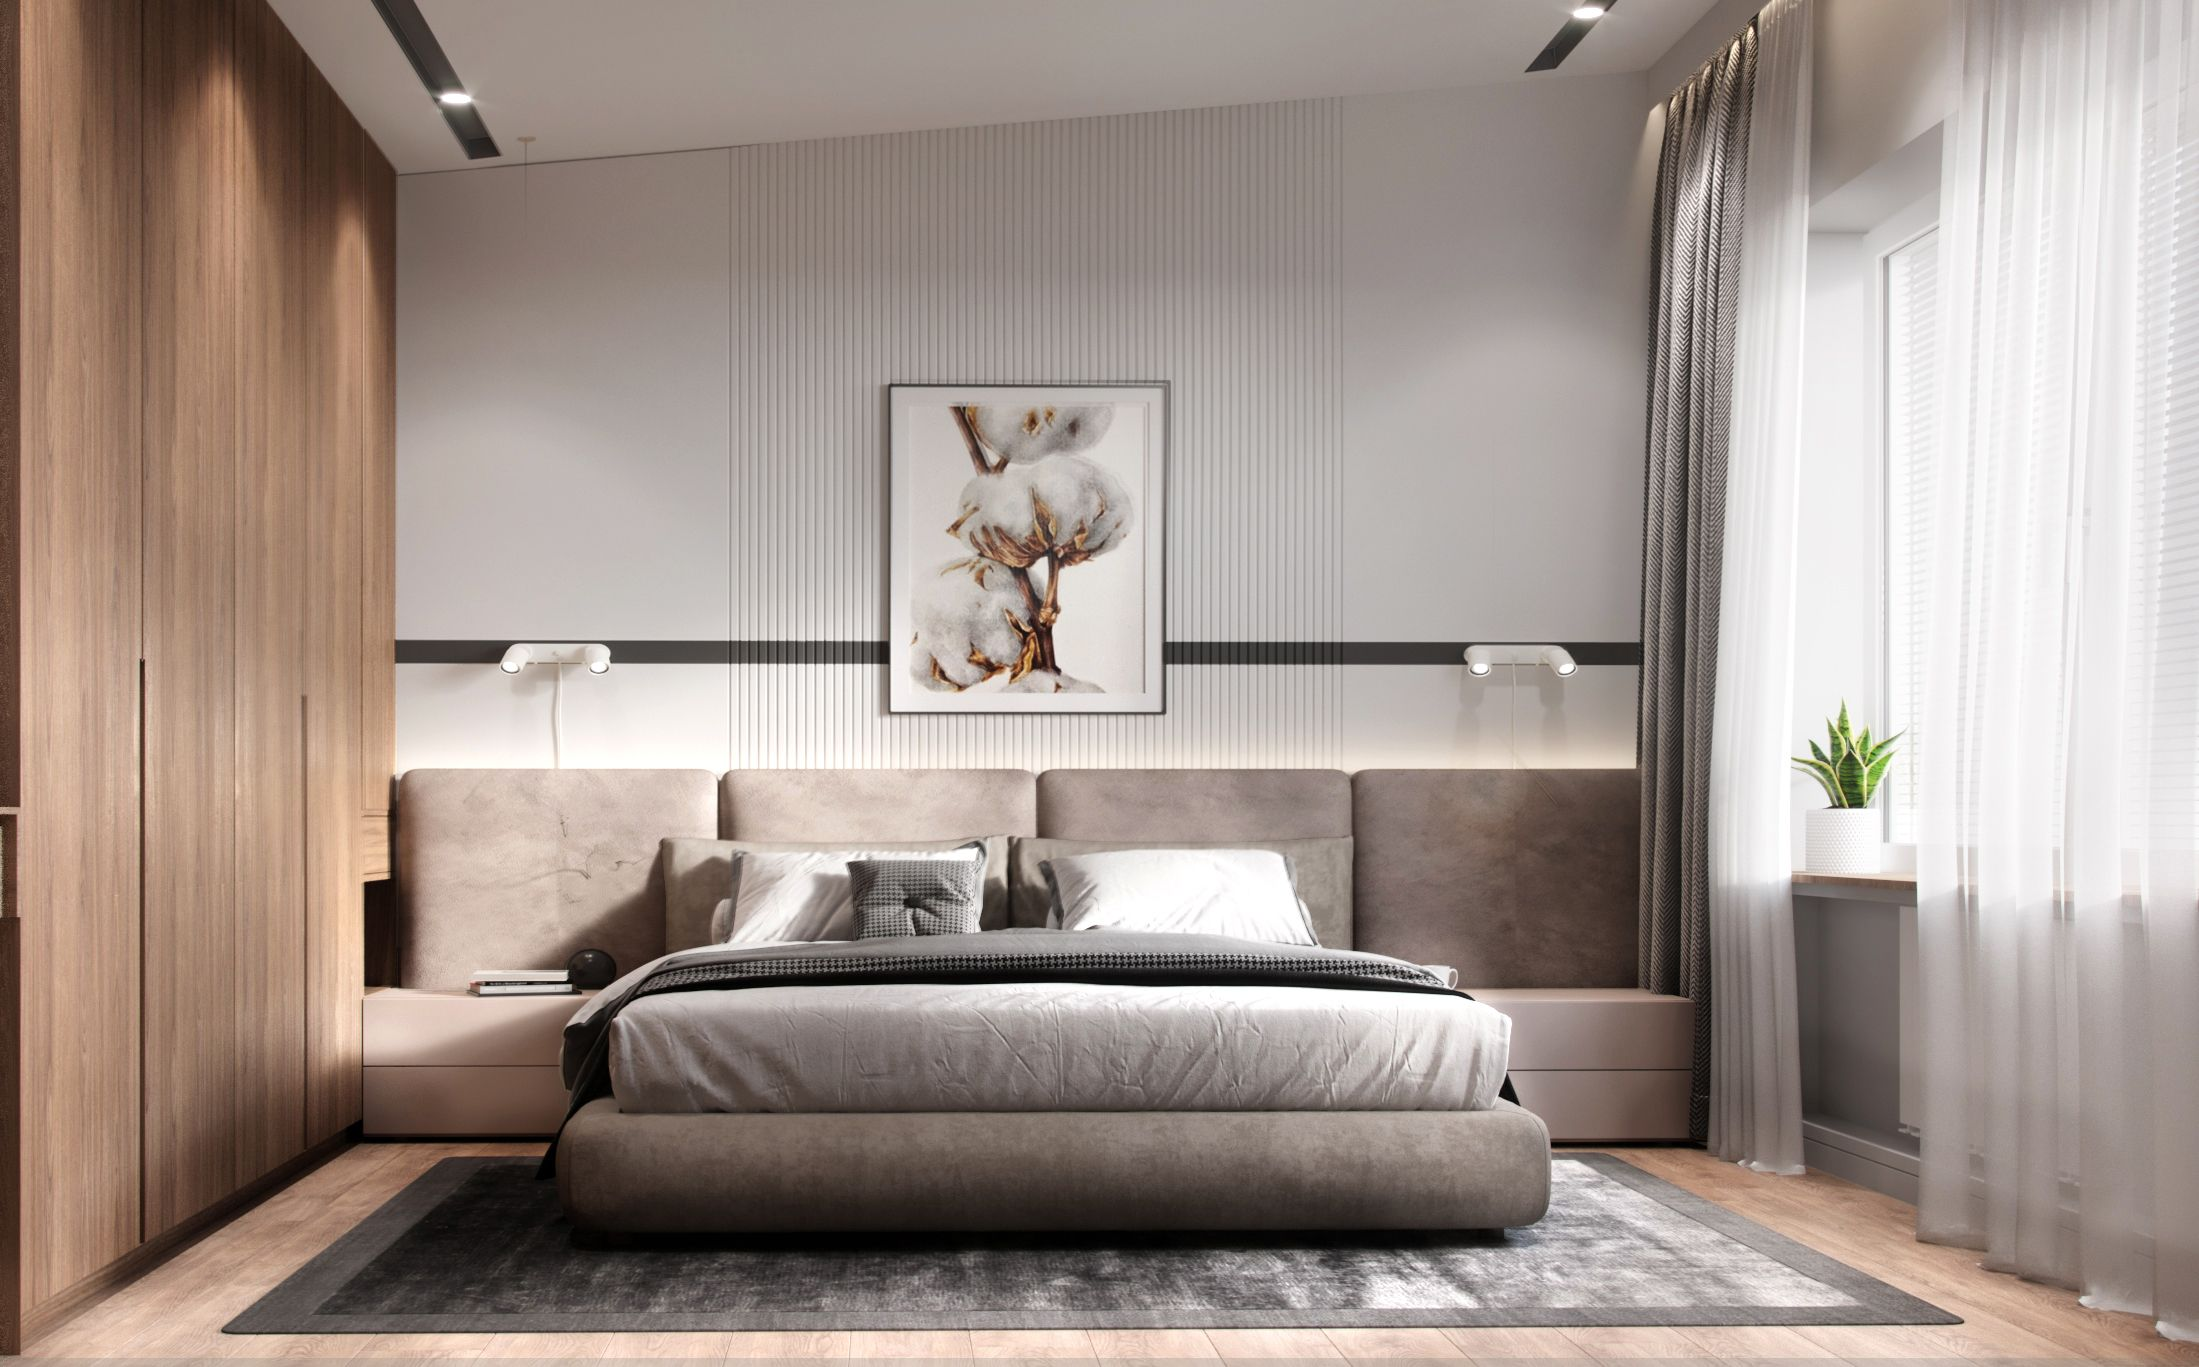 Bedroom Interior Design Wood White Scandinavian Style Minimalism Modern Scandinavian Design Bedroom Bedroom Interior Scandinavian Style Bedroom Bedroom design wooden interior